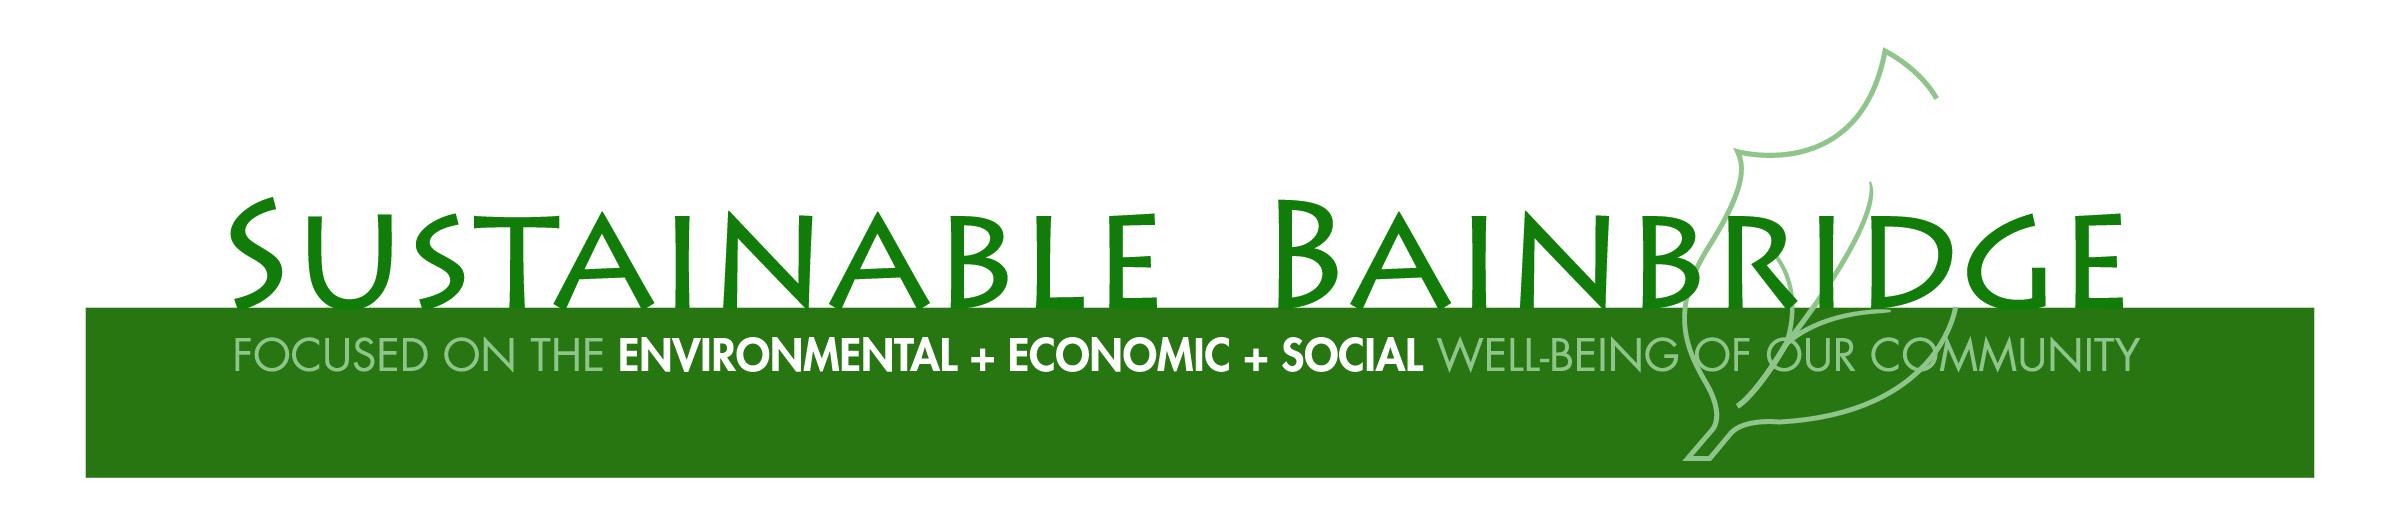 Sustainable_Bainbridge_Logo-02.jpeg